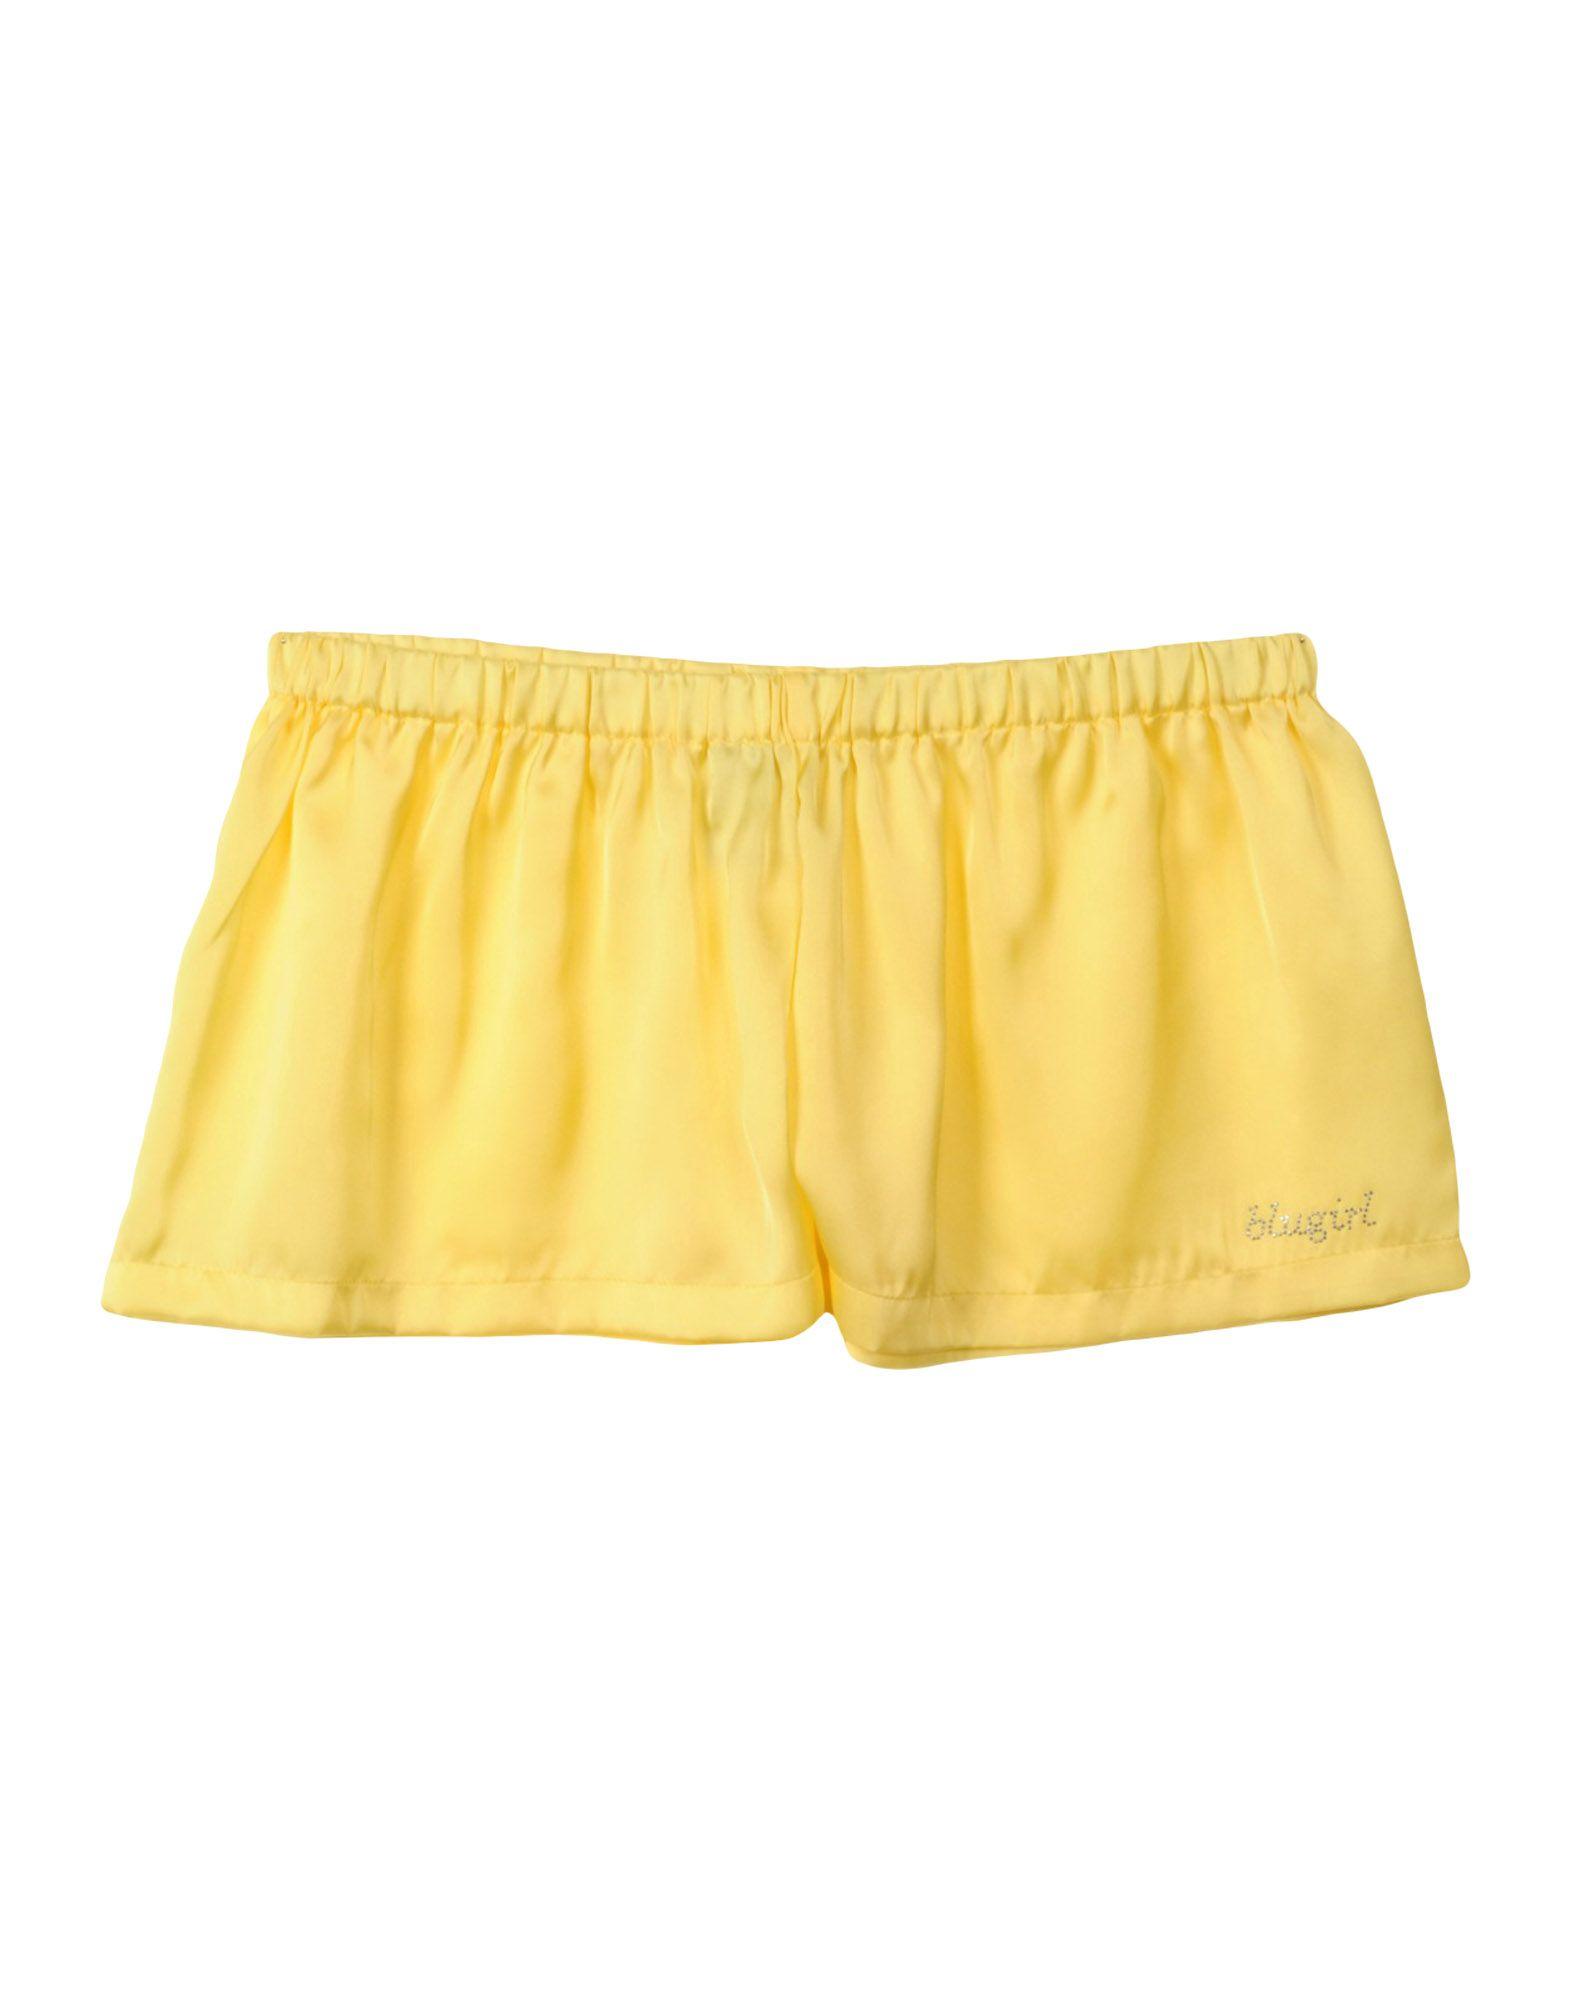 ФОТО blugirl blumarine underwear Пижама